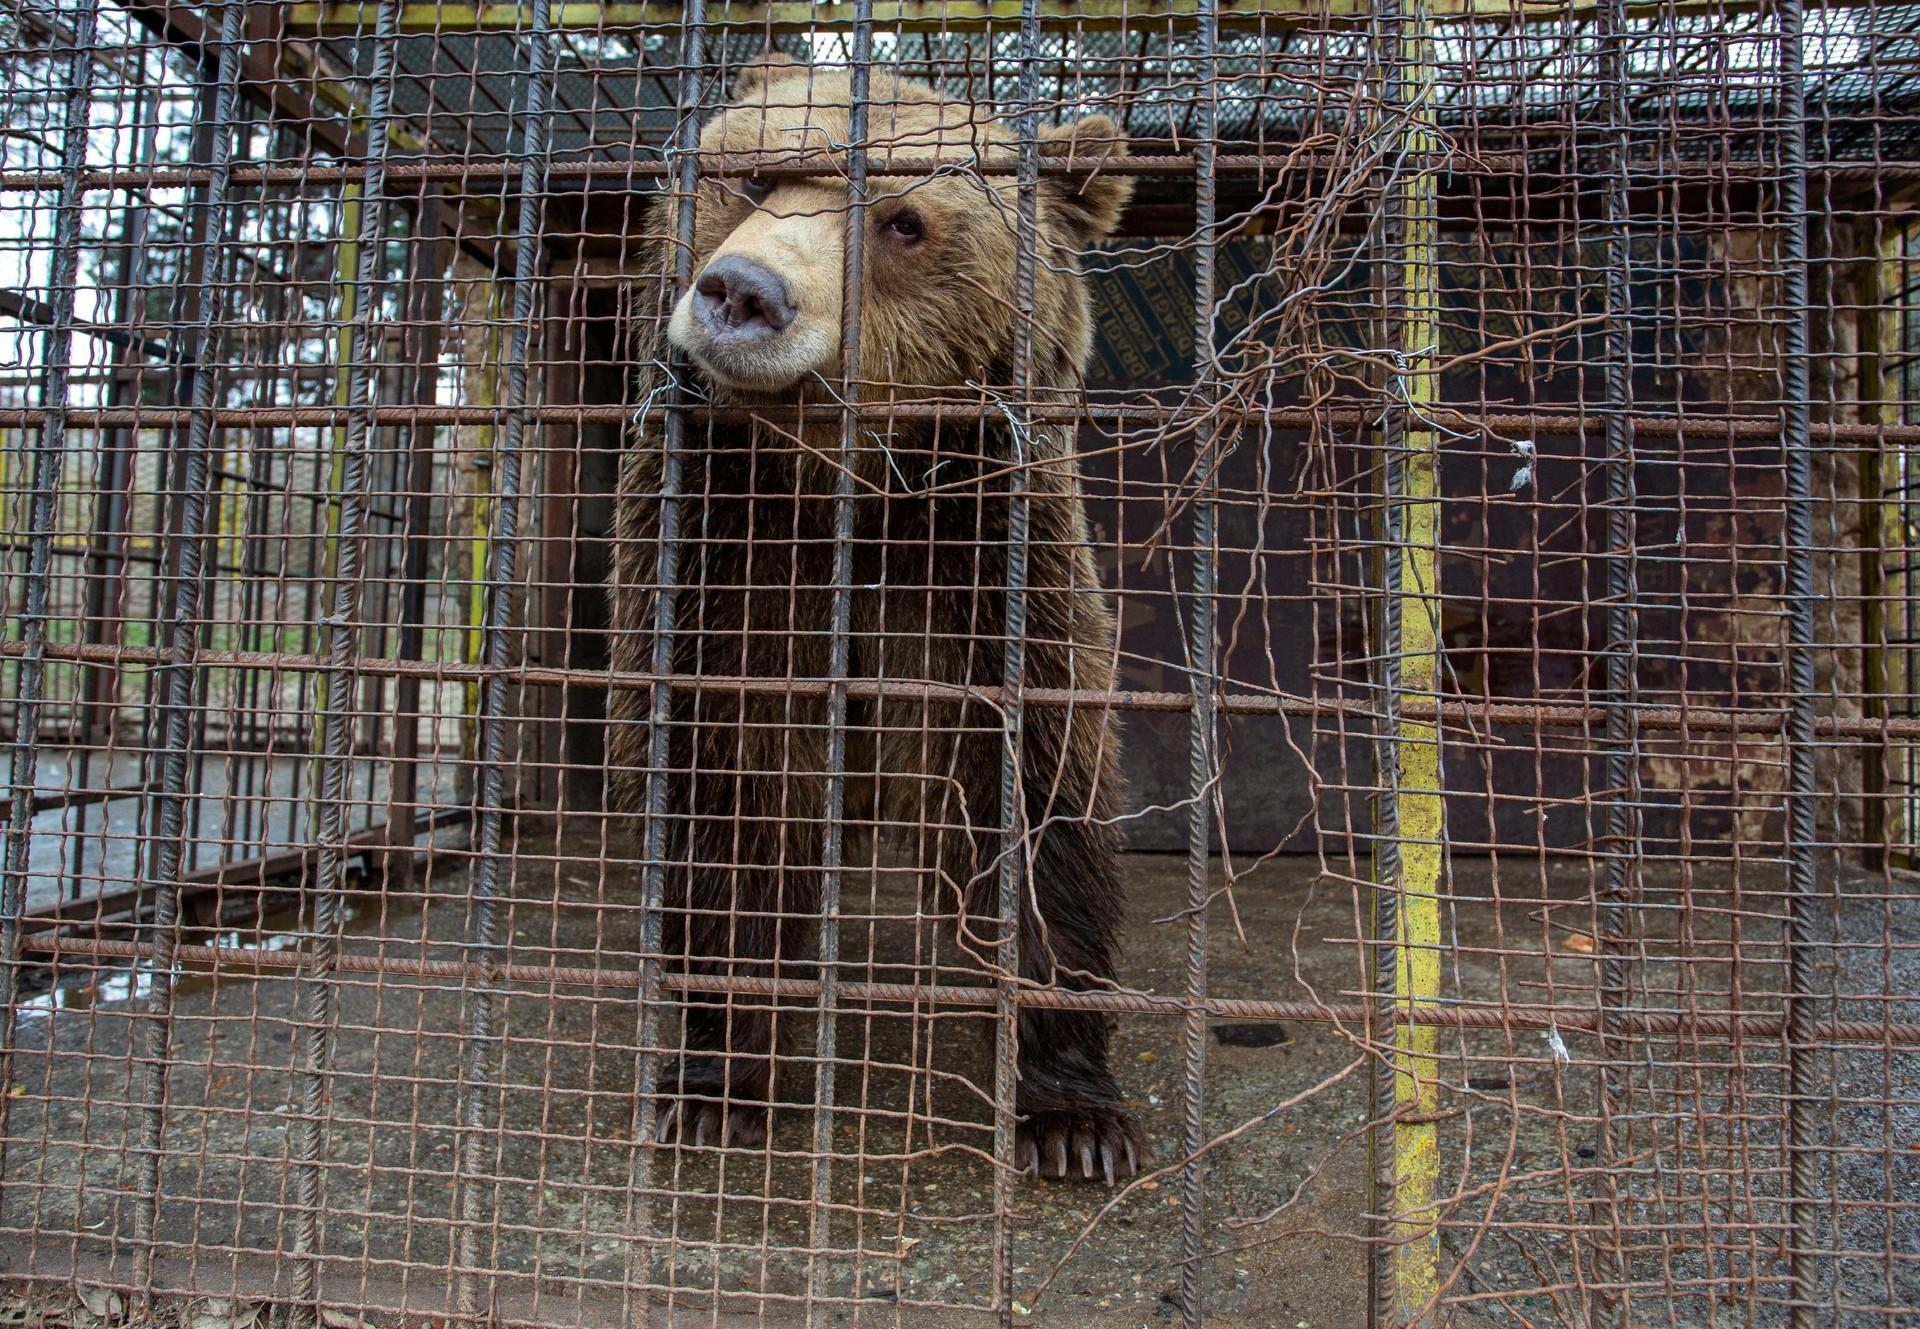 Bear Teddy in a tiny cage